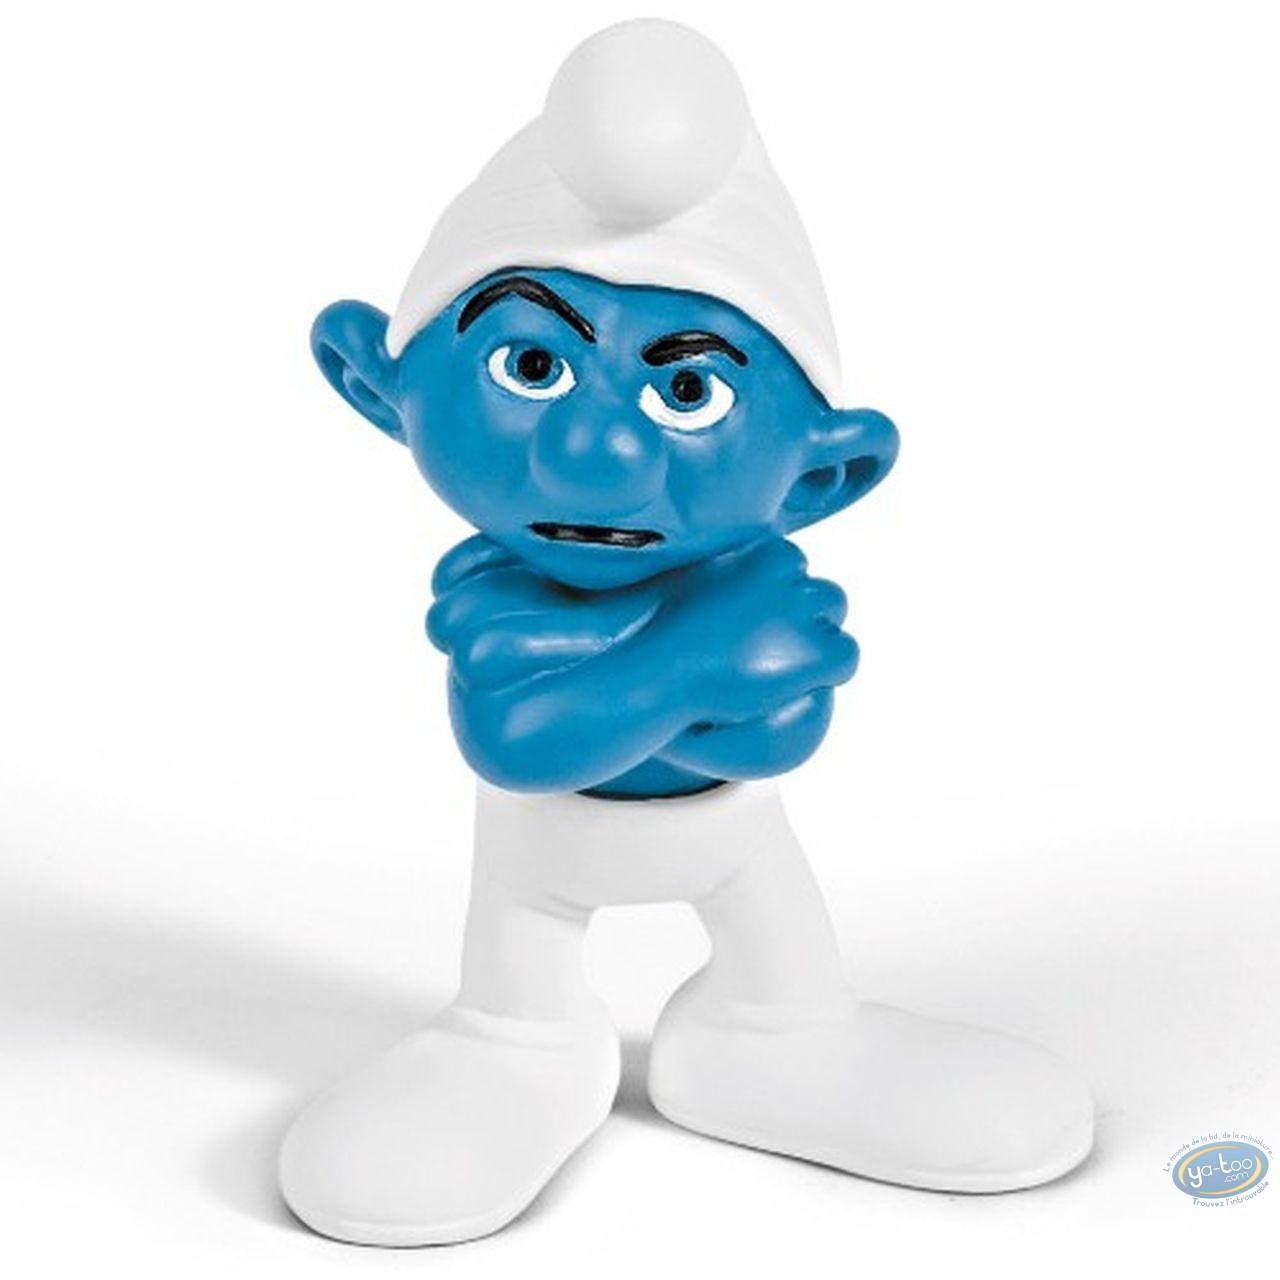 Plastic Figurine, Smurfs (The) : Grumpy Smurf (movie version)